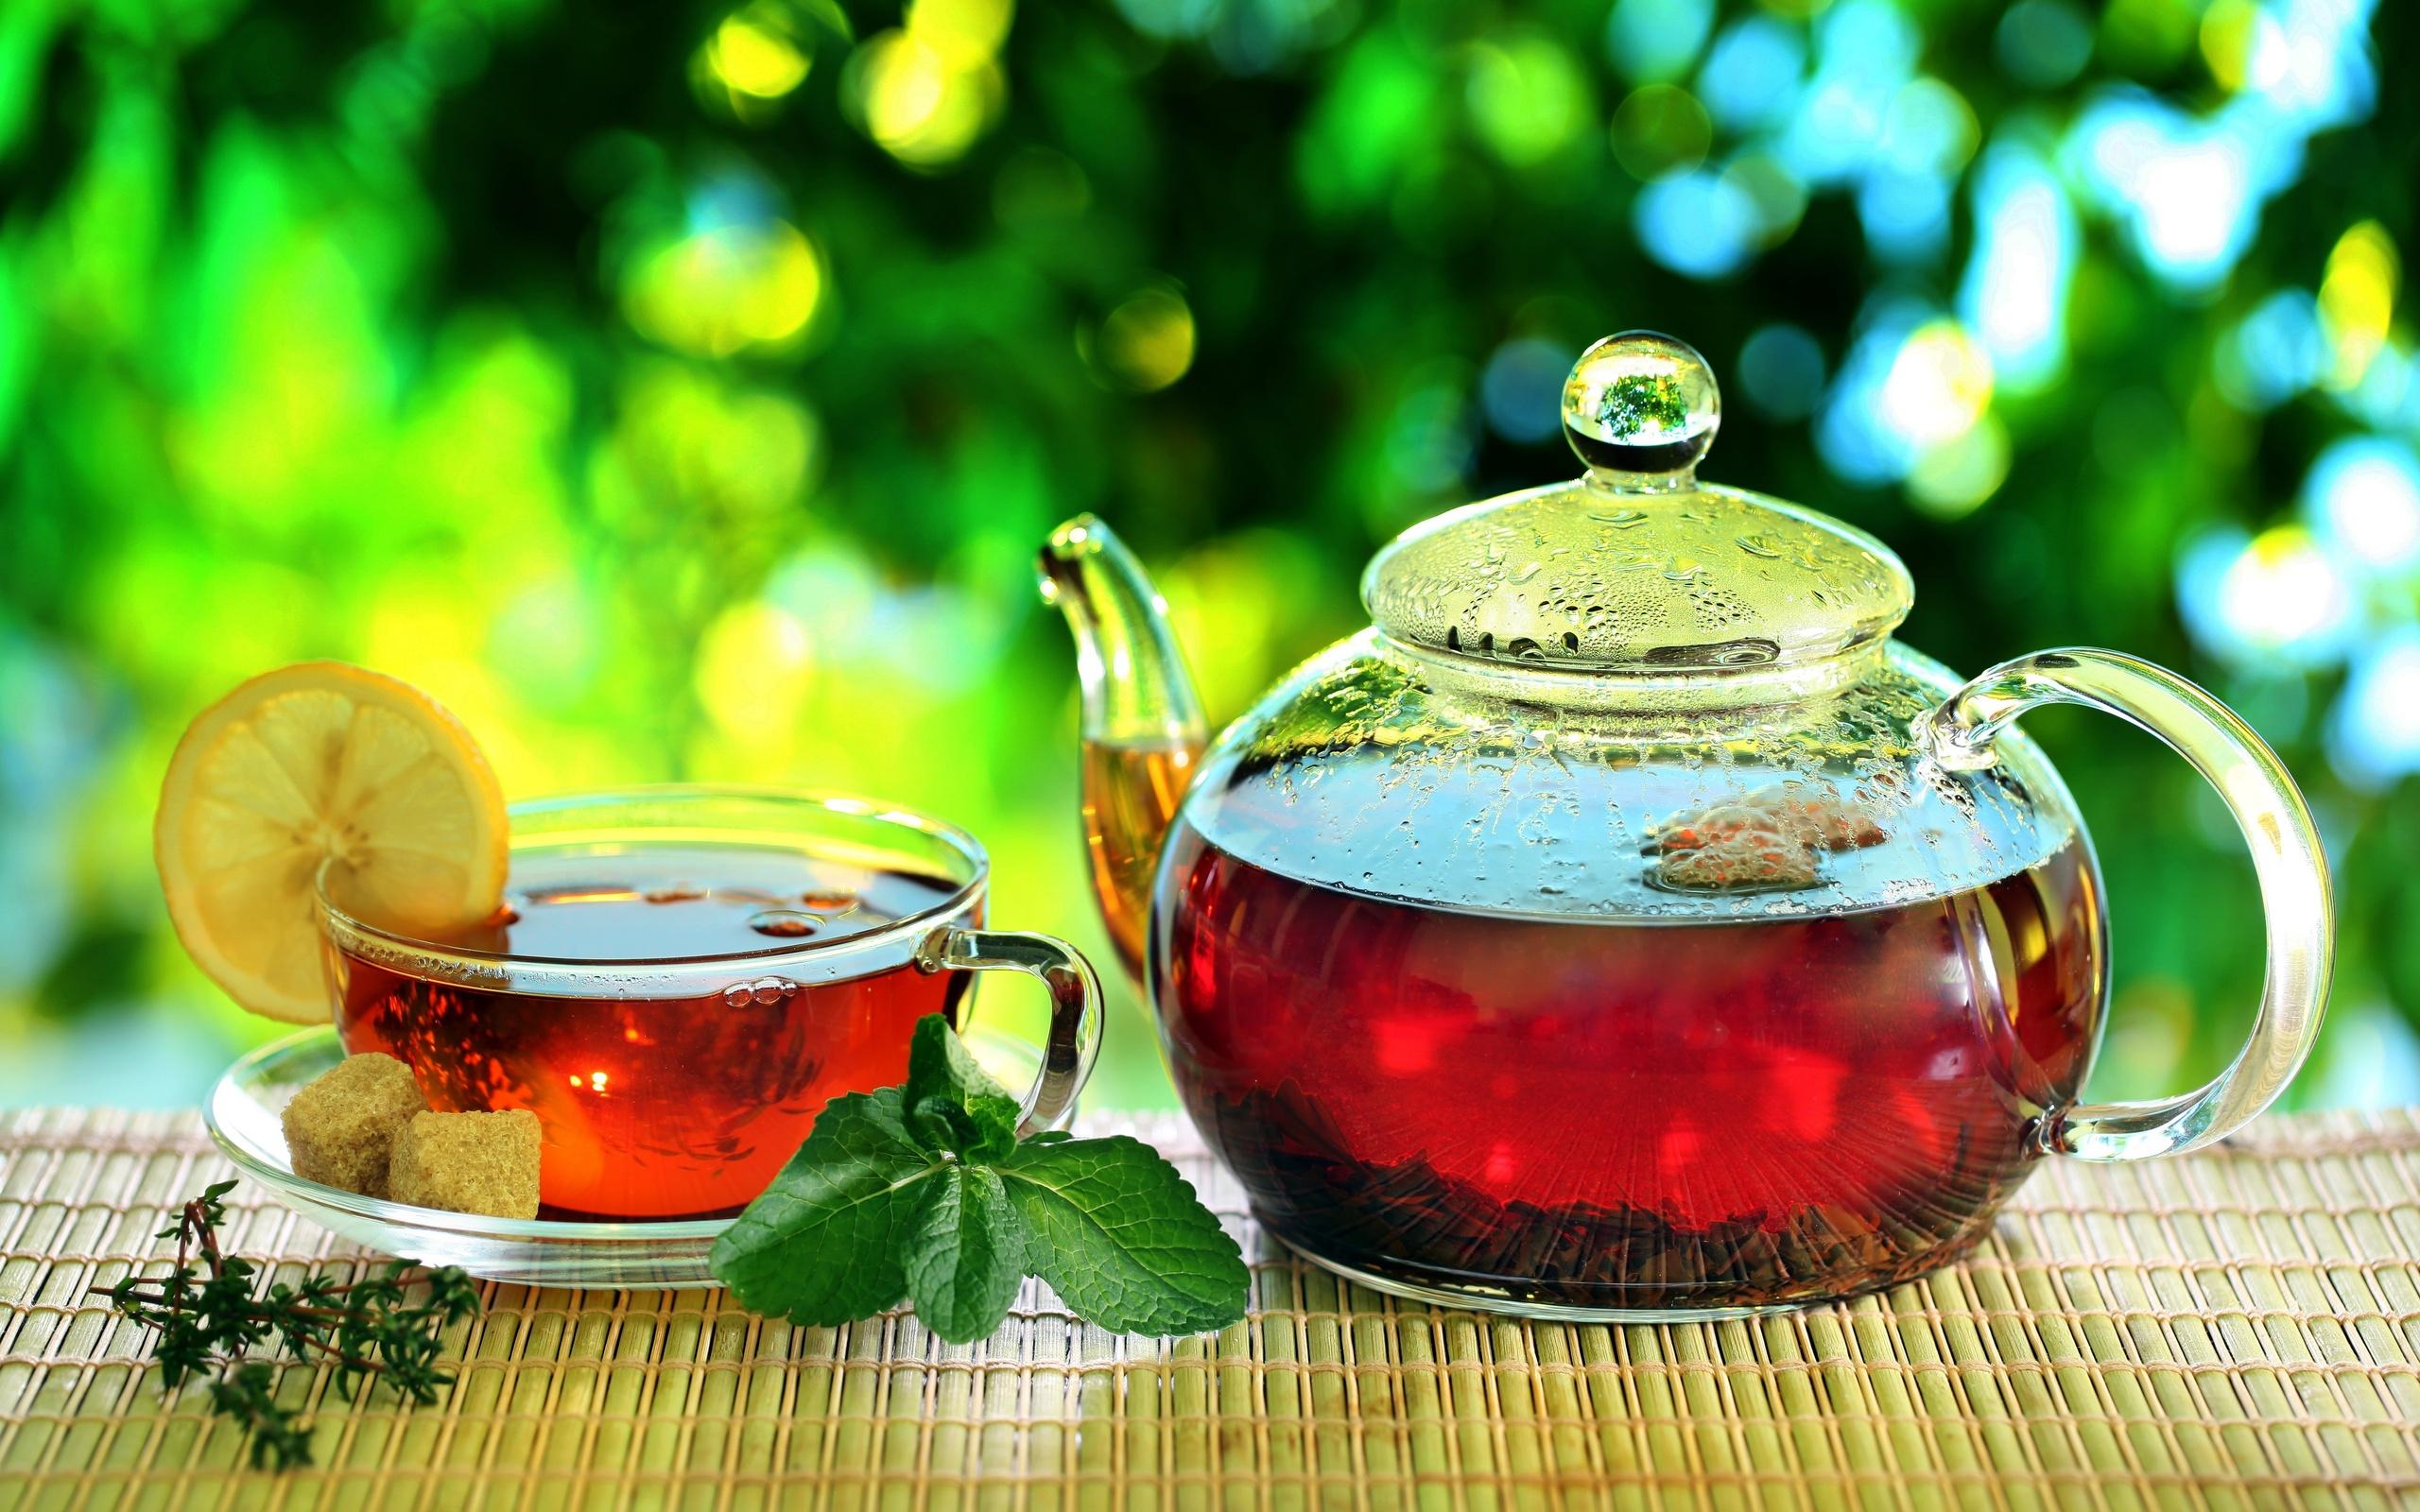 Обои клюква, Заварник, мёд, чай. Еда foto 16